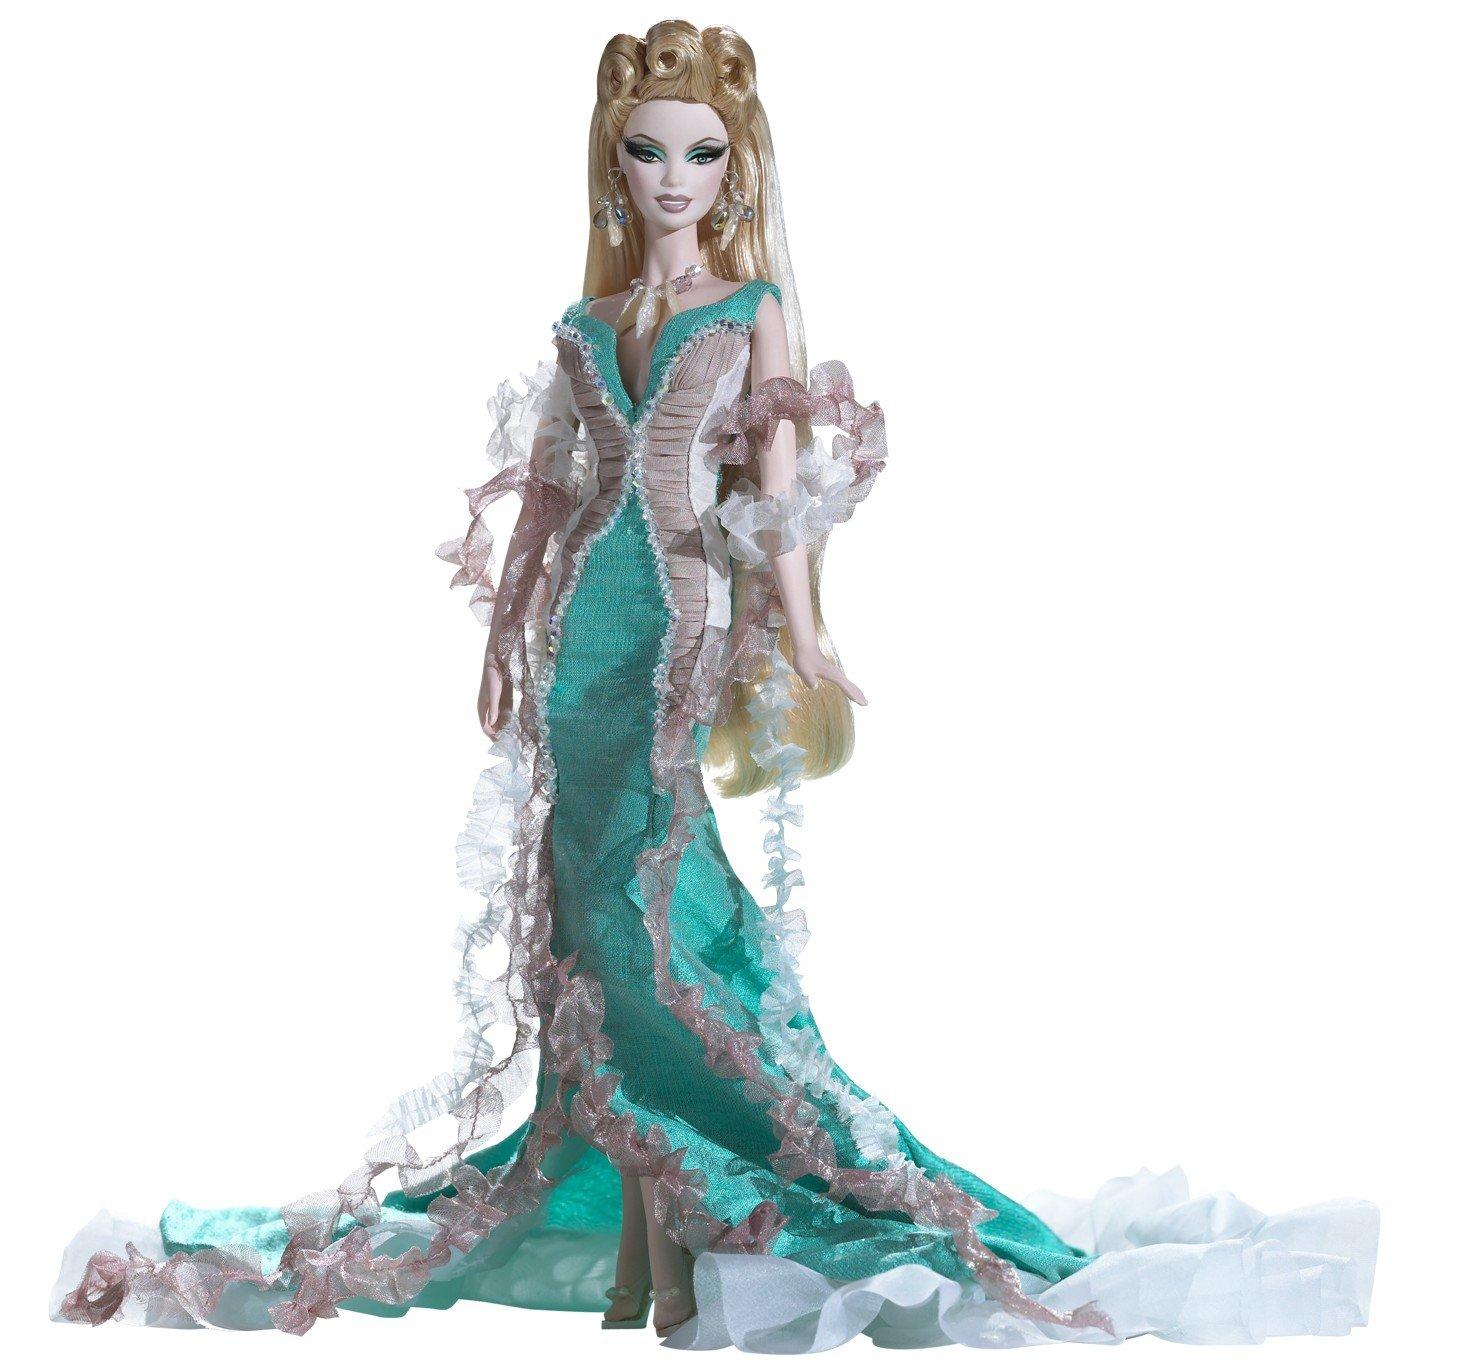 Barbie Exclusive 2009 GOLD Fantasy Series - APHRODITE